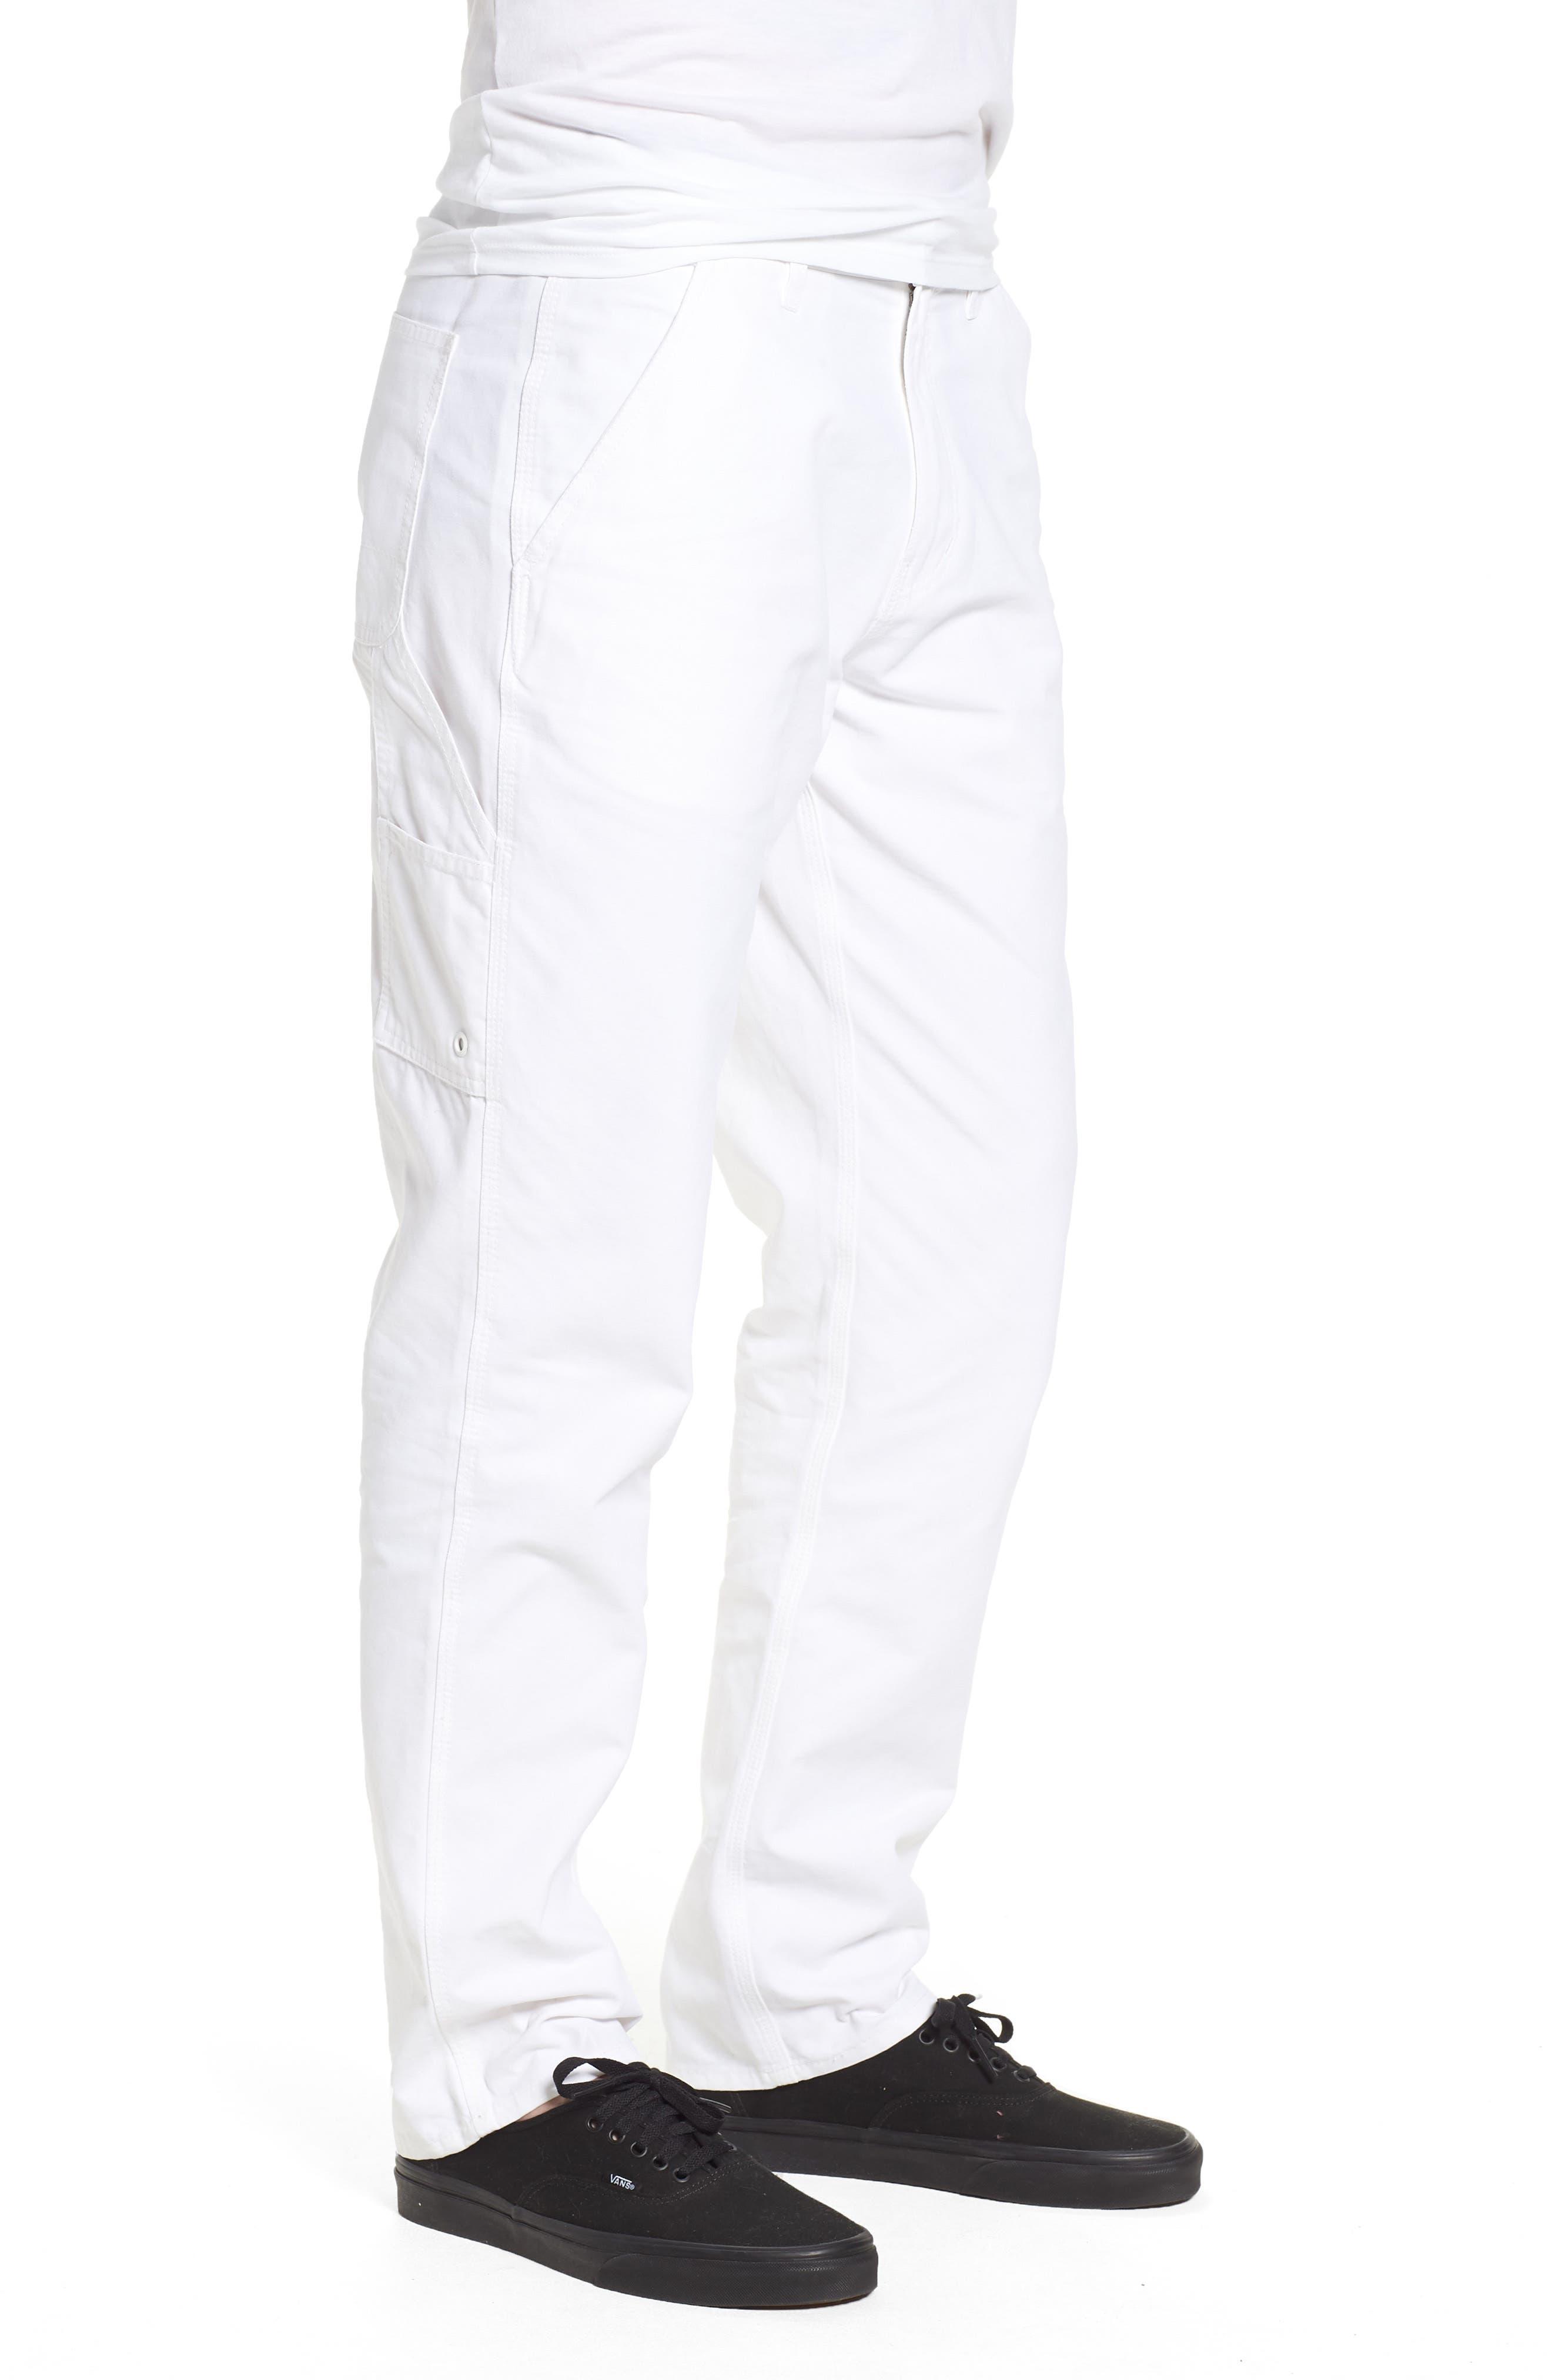 Westport Utility Pants,                             Alternate thumbnail 3, color,                             White